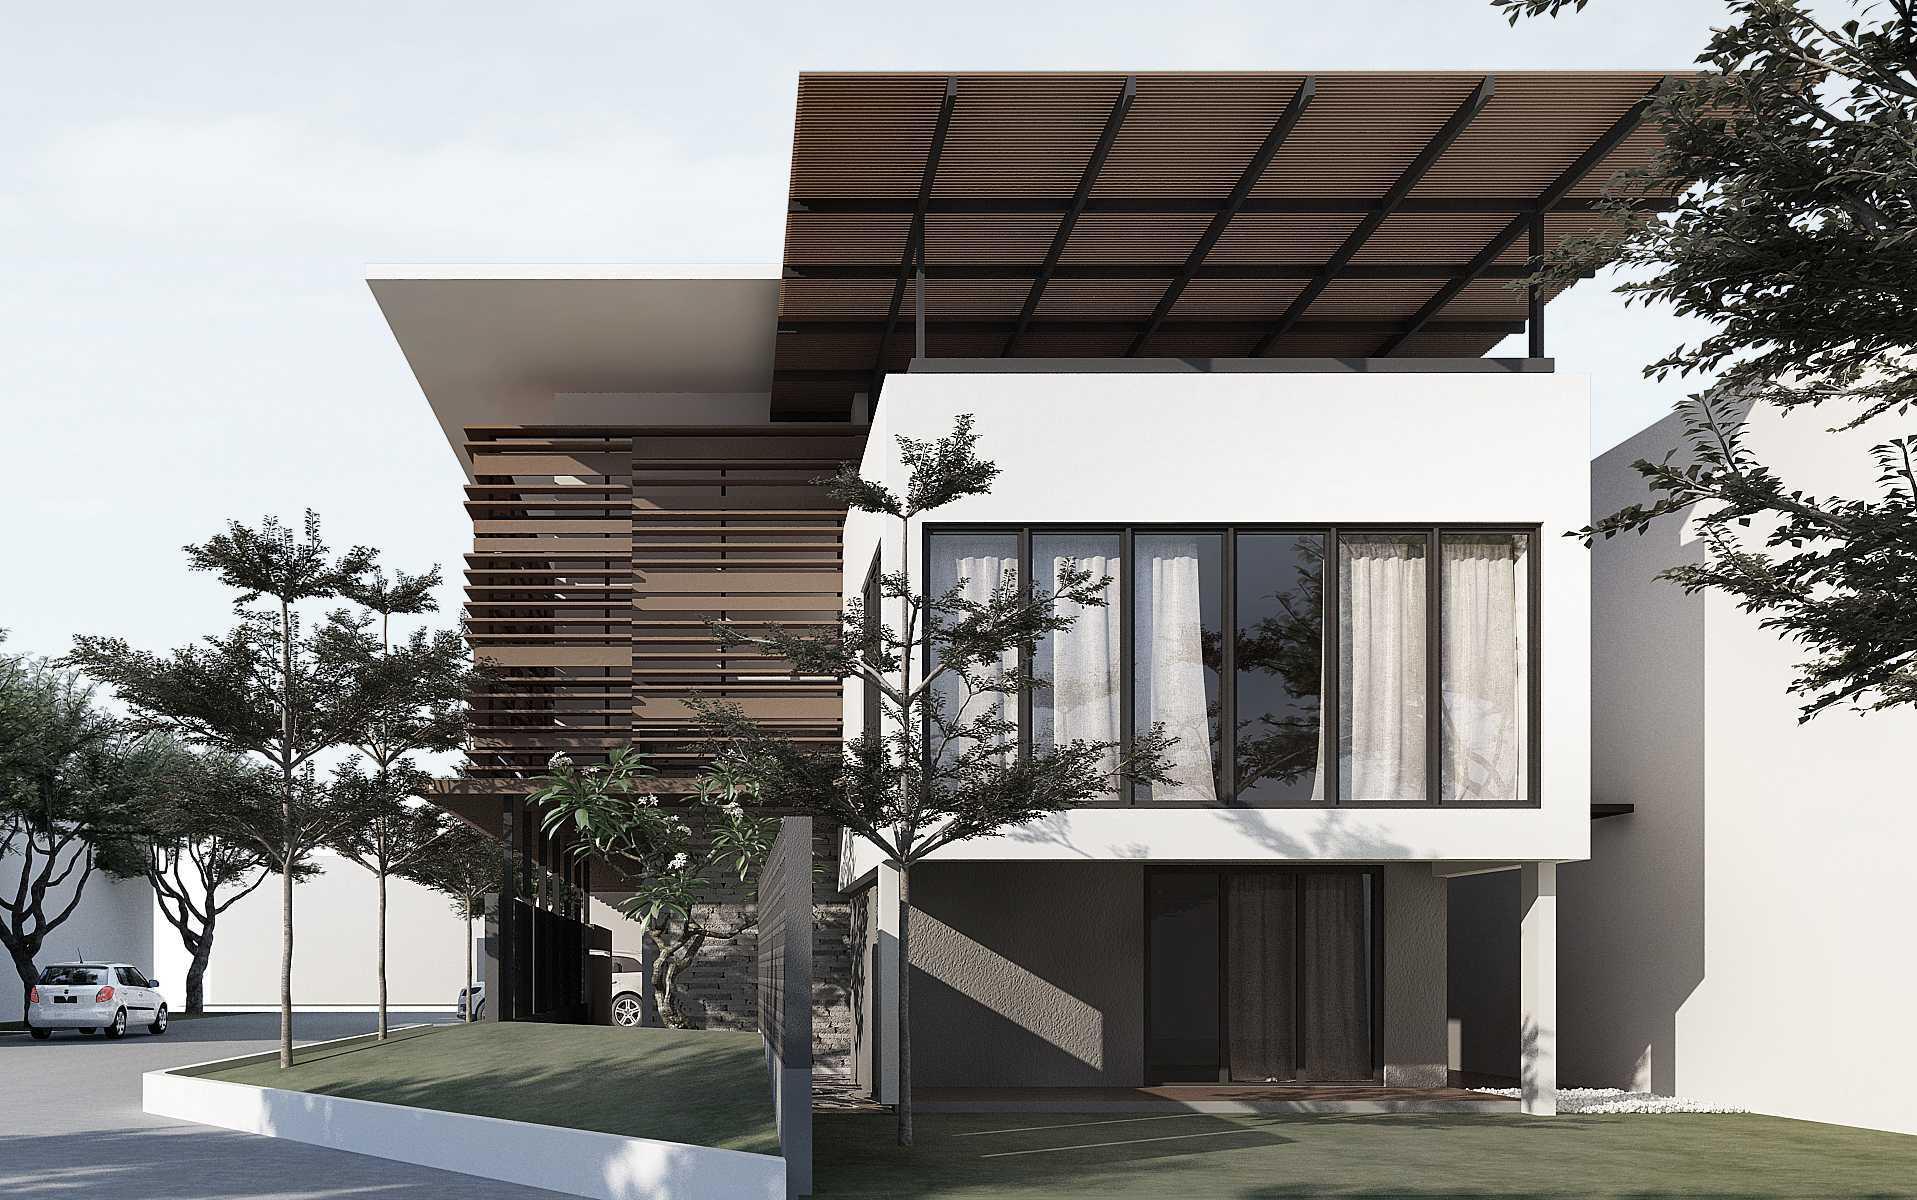 Access Architect Sa House Semarang, Kota Semarang, Jawa Tengah, Indonesia Semarang, Kota Semarang, Jawa Tengah, Indonesia Rumah-Jangli-2   37180